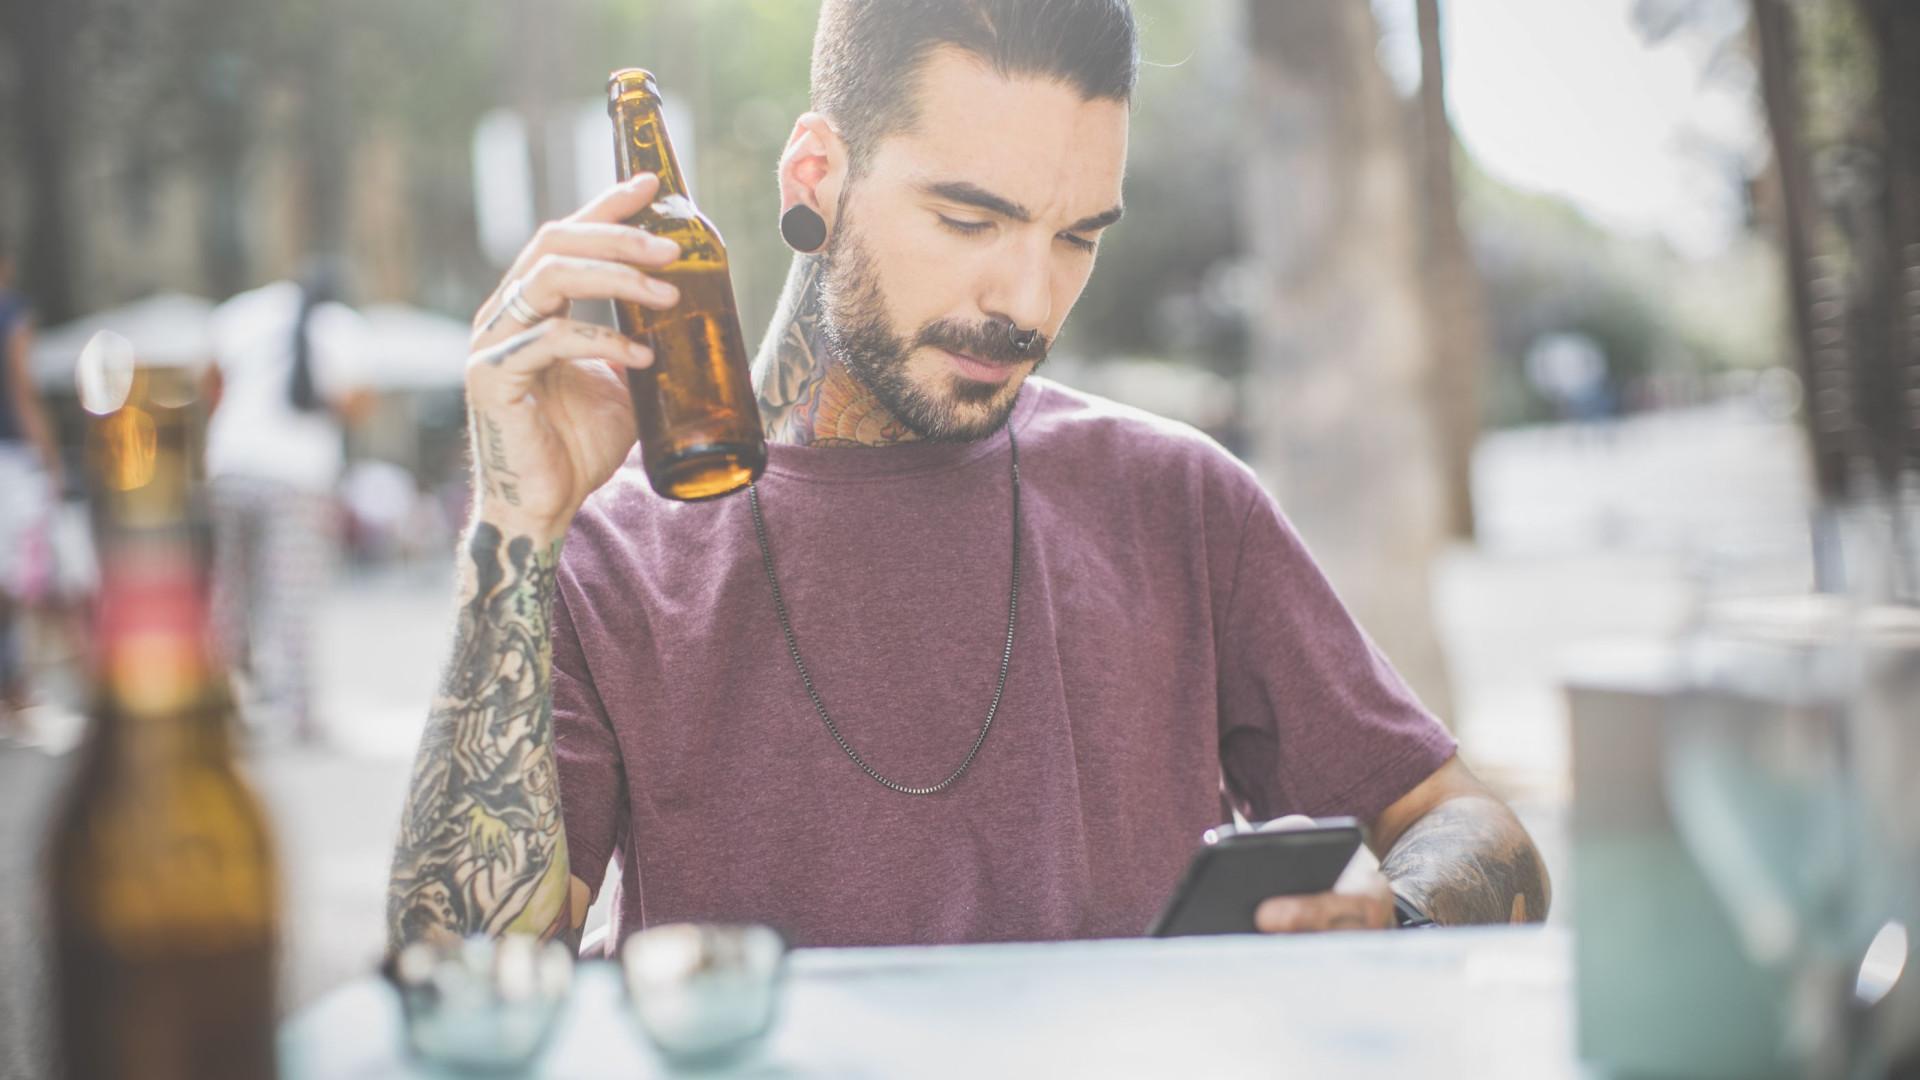 Esta é a quantidade de álcool que aumenta o risco de cancro da próstata